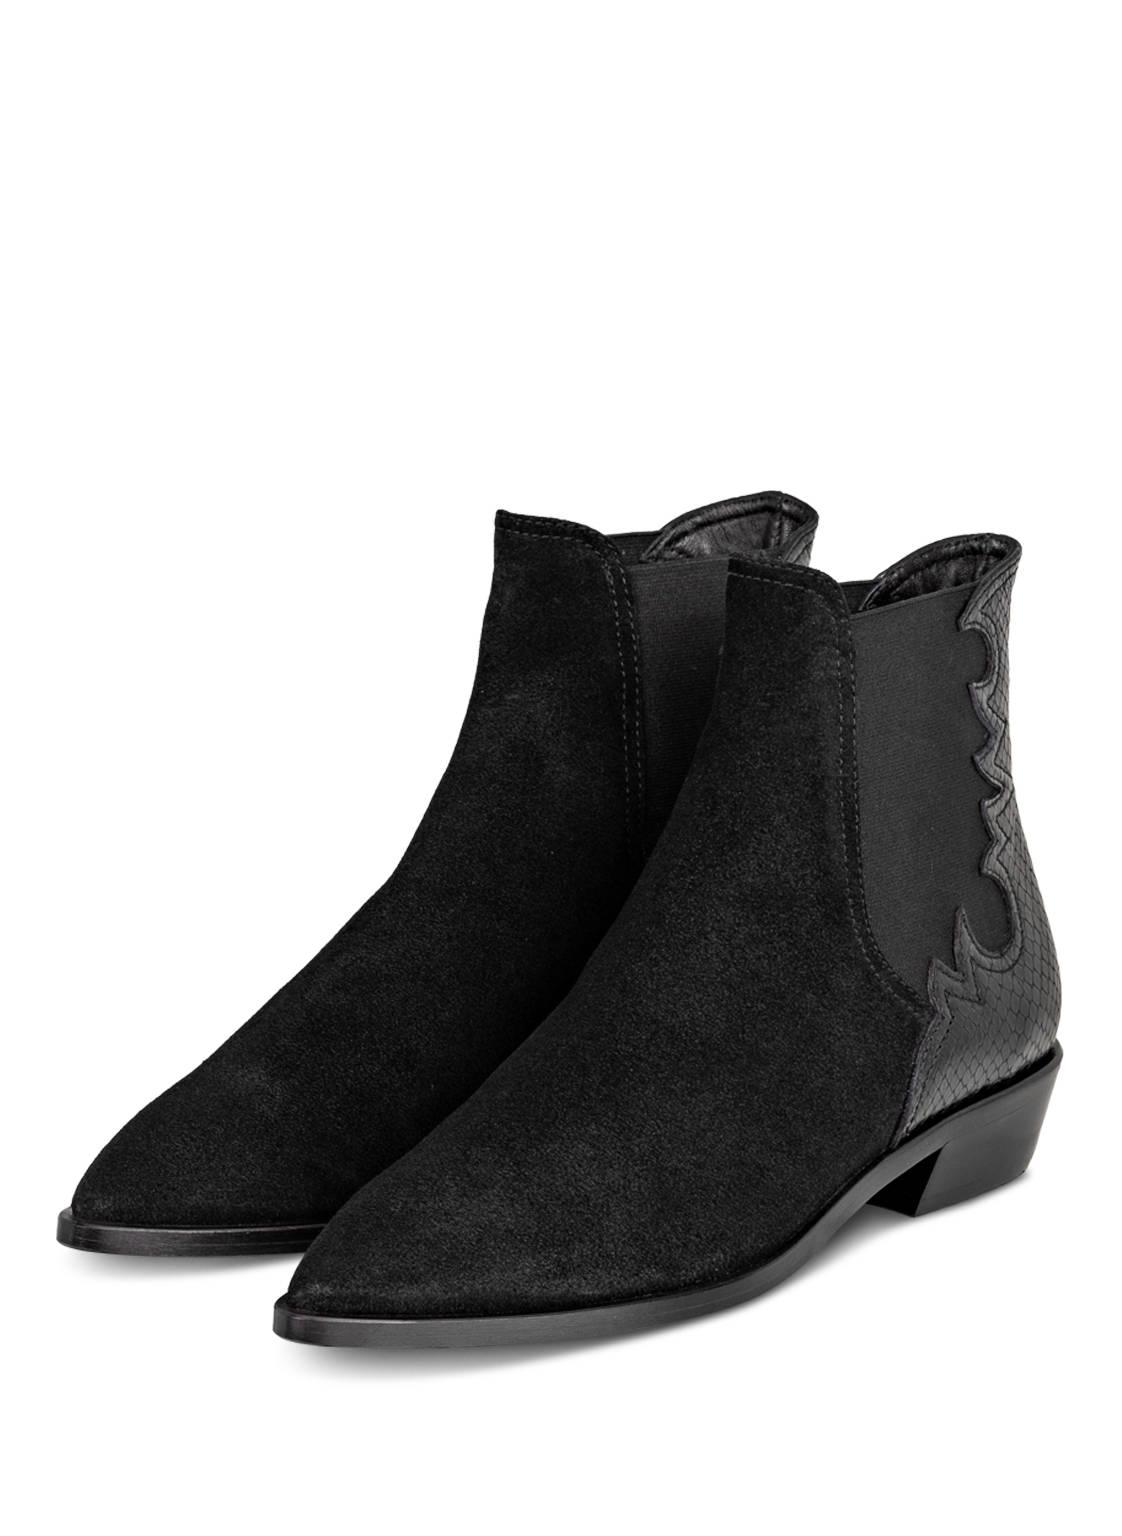 Image of Agl Attilio Giusti Leombruni Chelsea-Boots schwarz